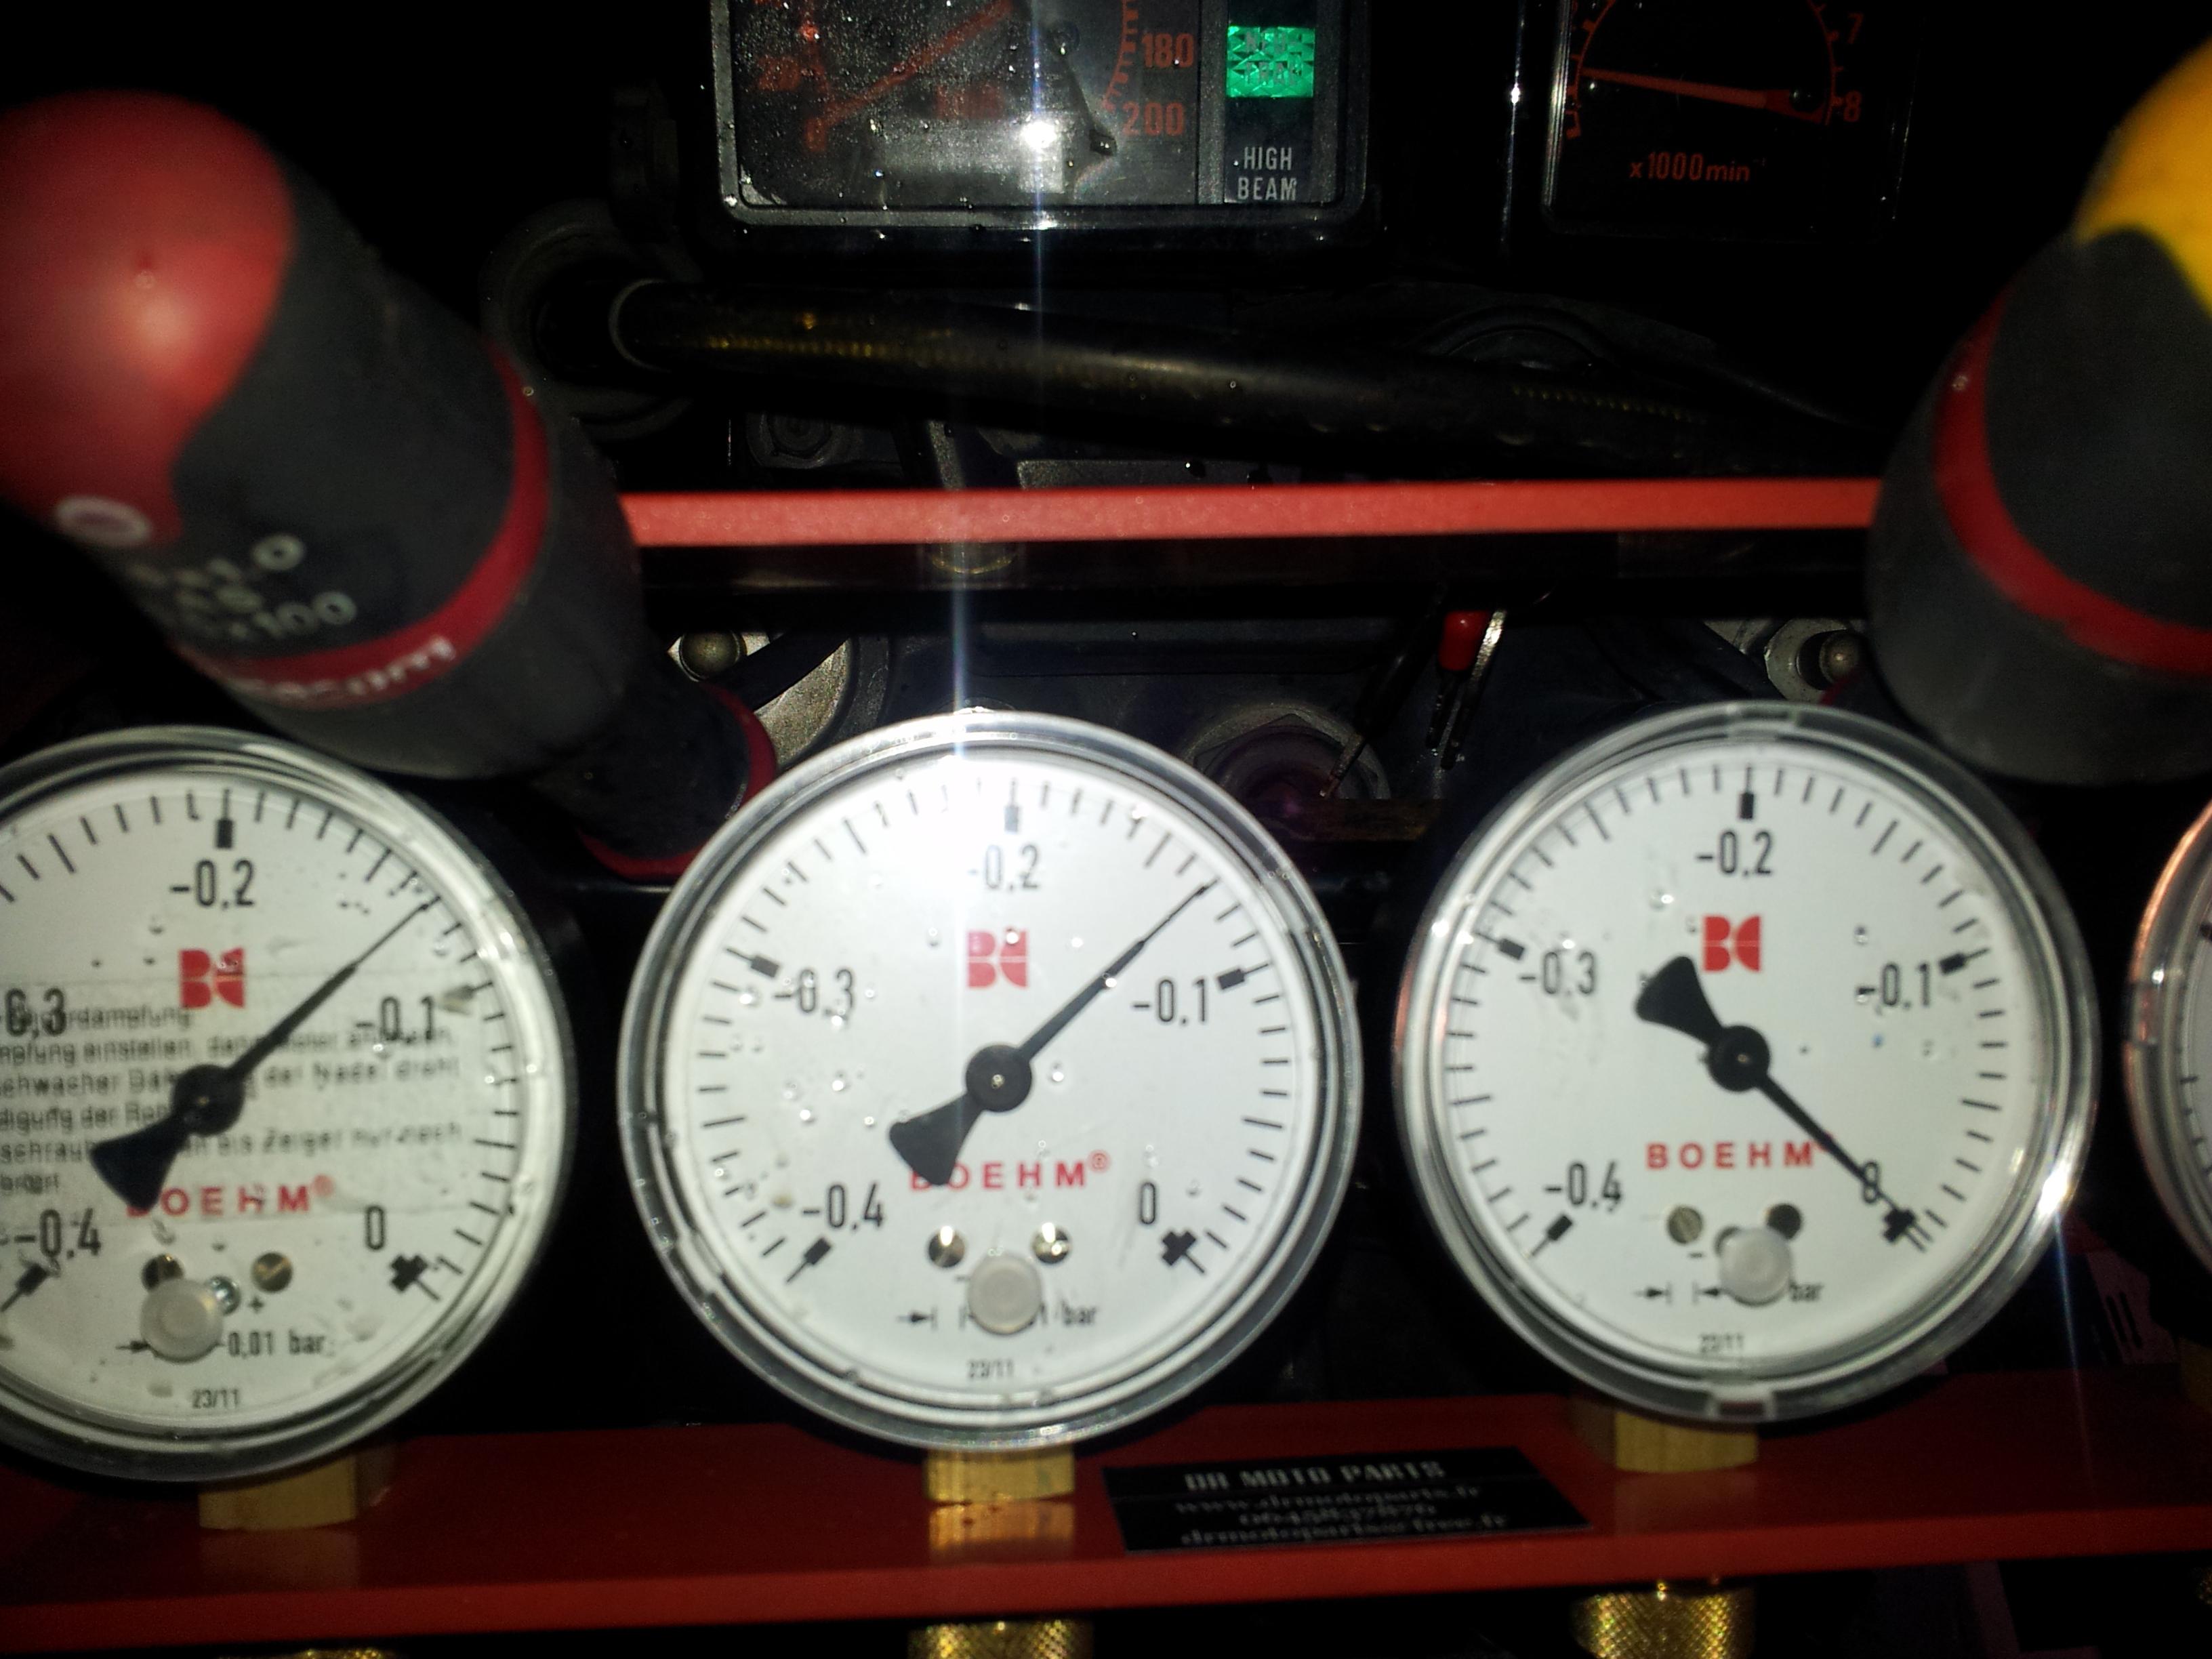 XLV 750 : Ralenti accéléré (2000/2500 tours/m)  [RESOLU] - Page 3 XLV%20750%20syncro%201200